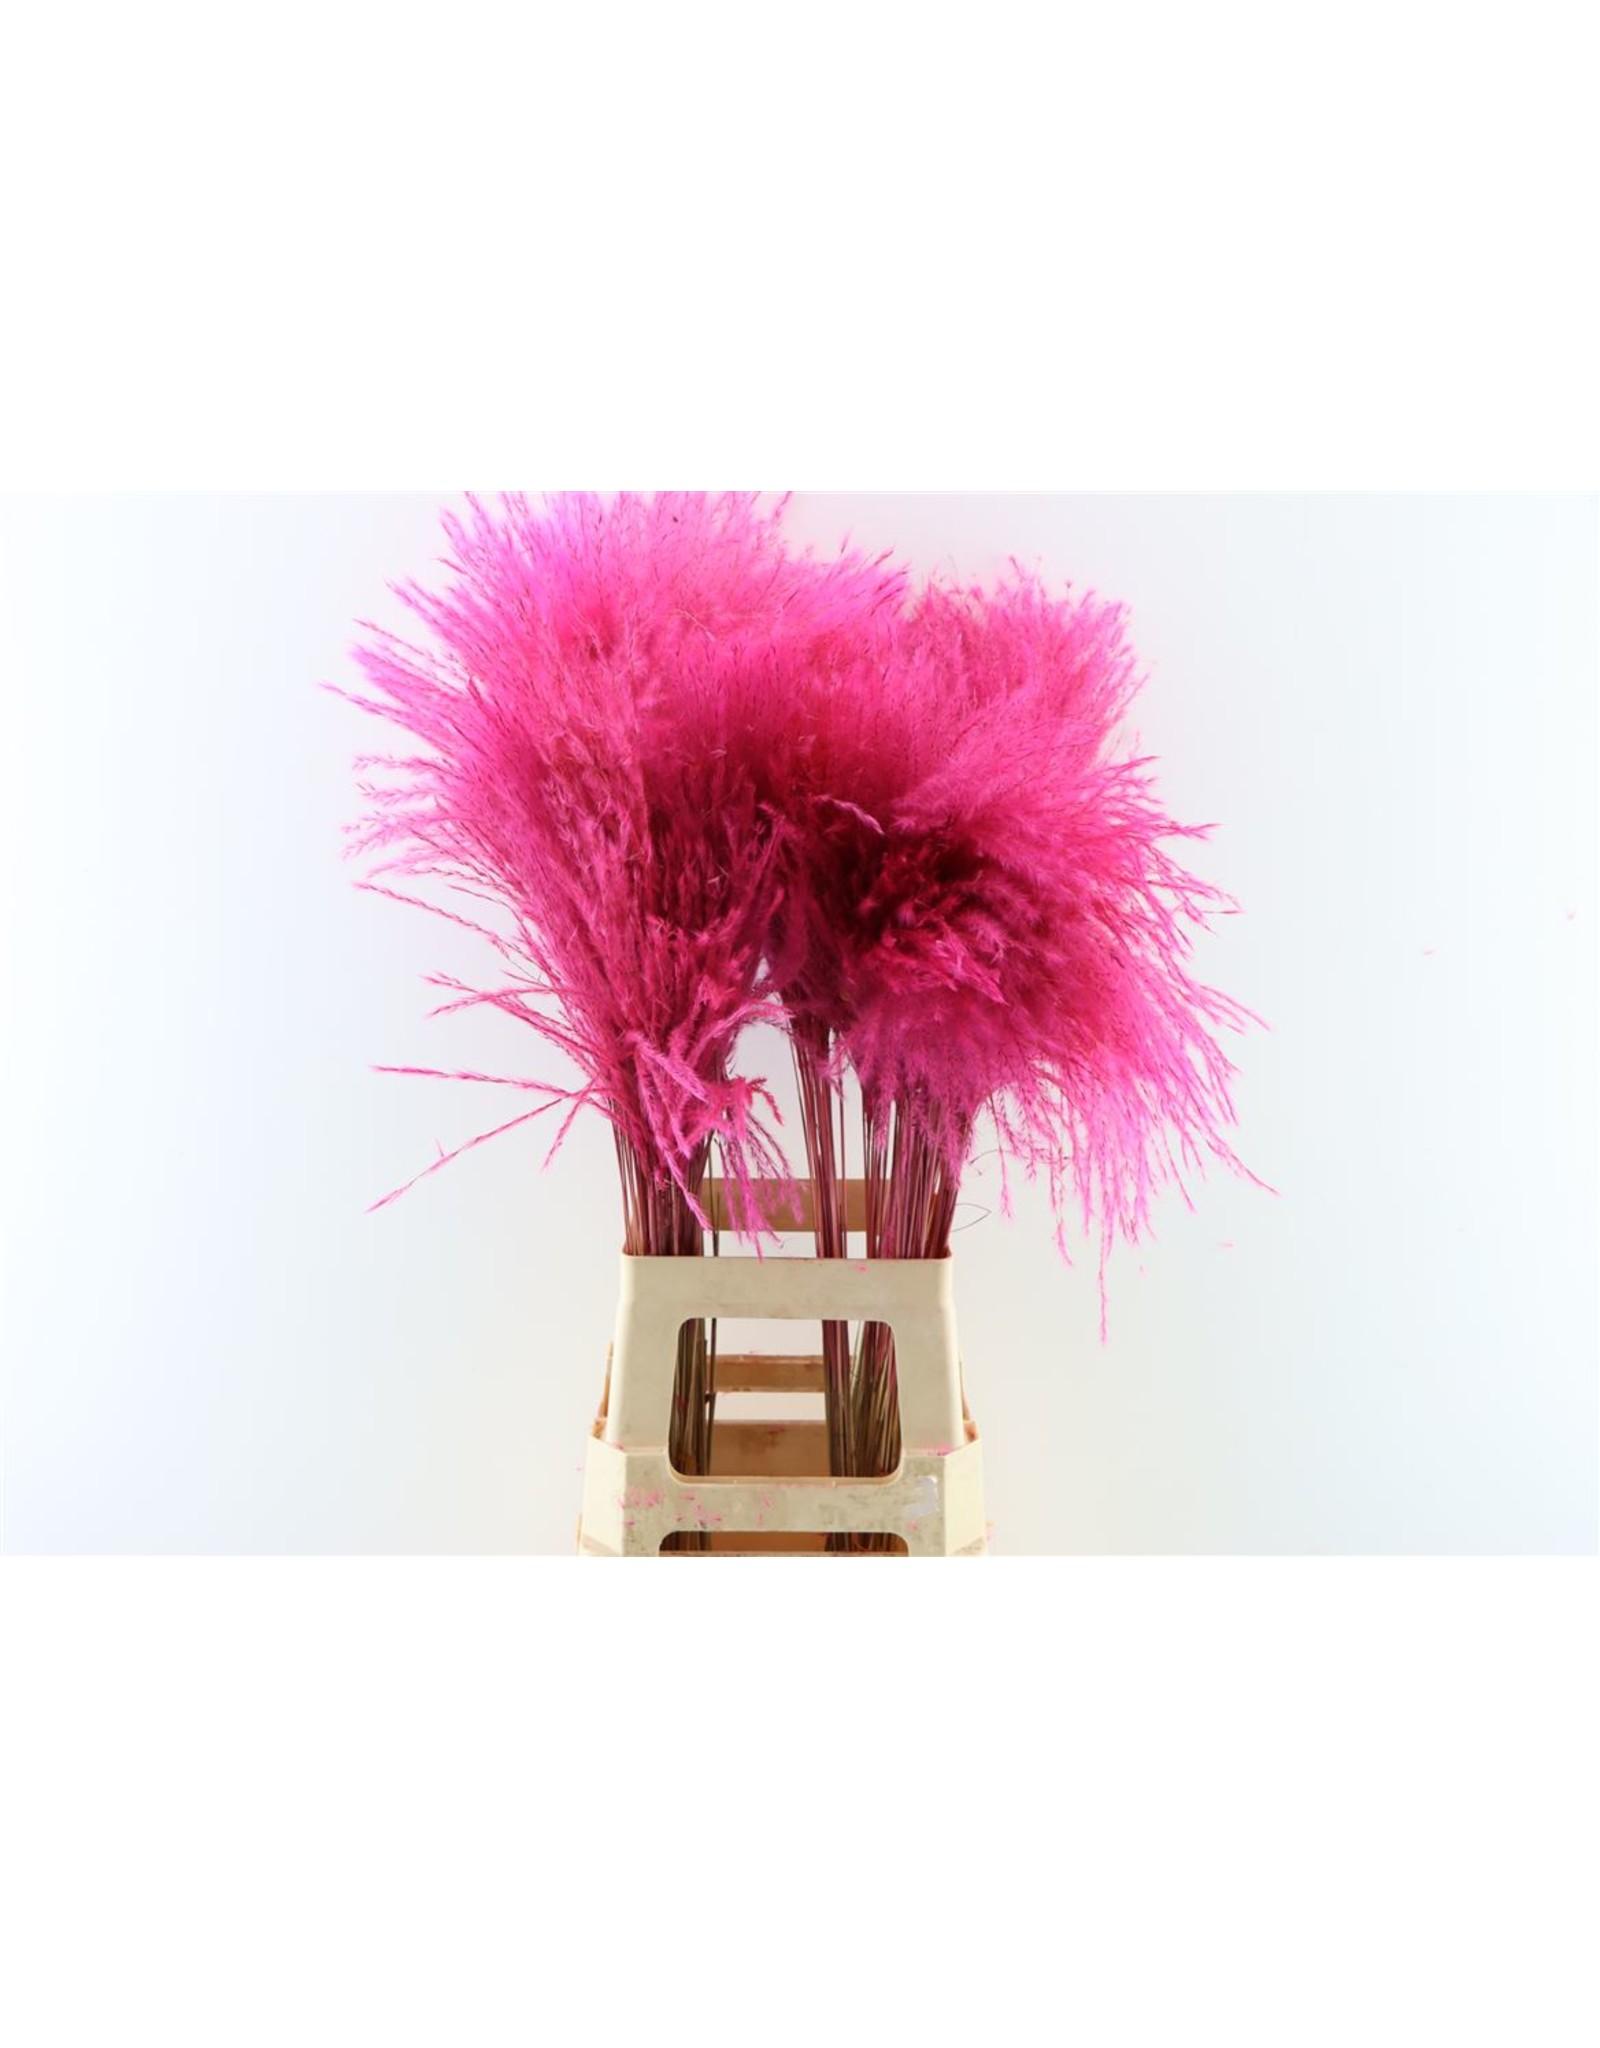 Dried Stipa Feather Cerise P. Stem x 50